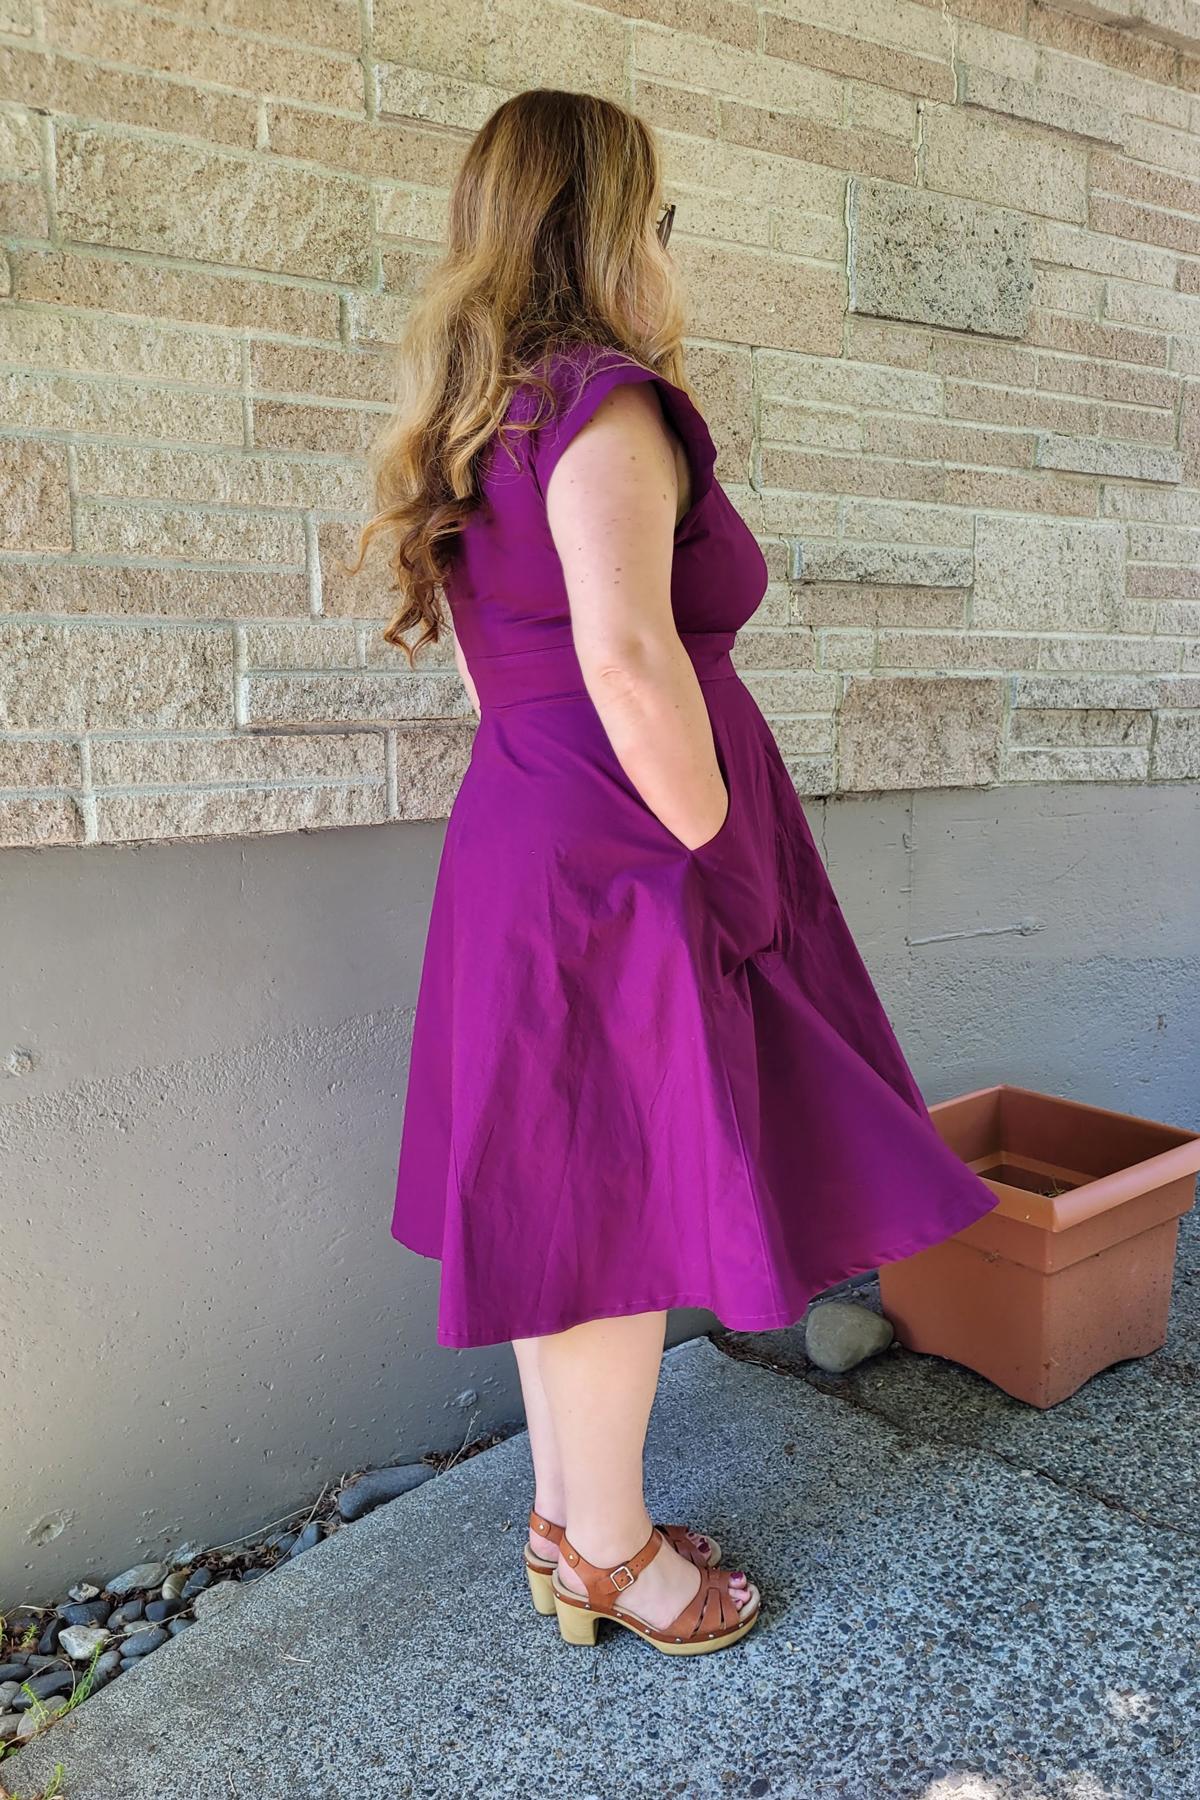 Claire's Matilda Curve Tester Make